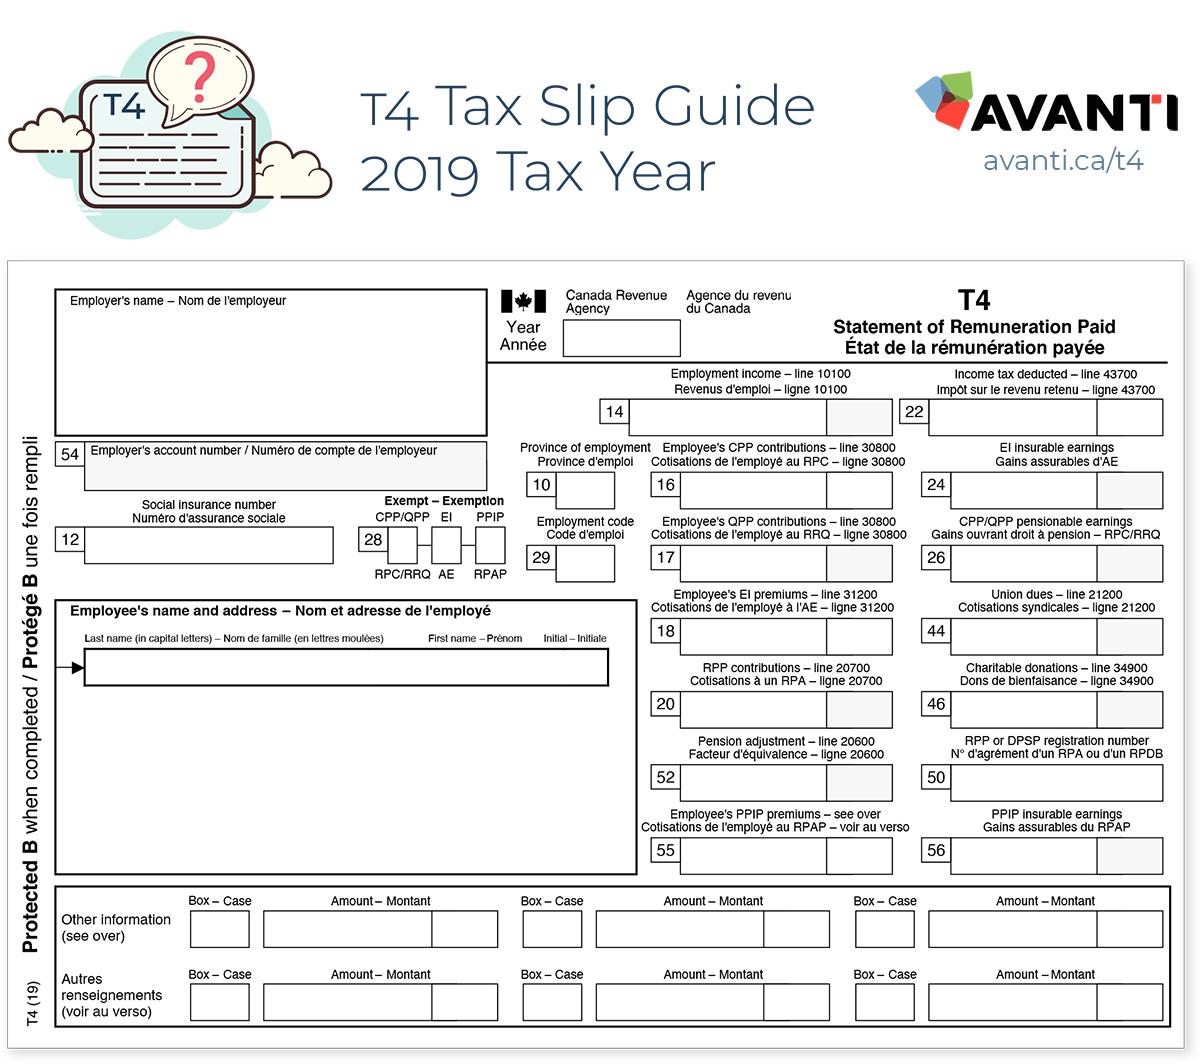 T4 Tax Slip Guide